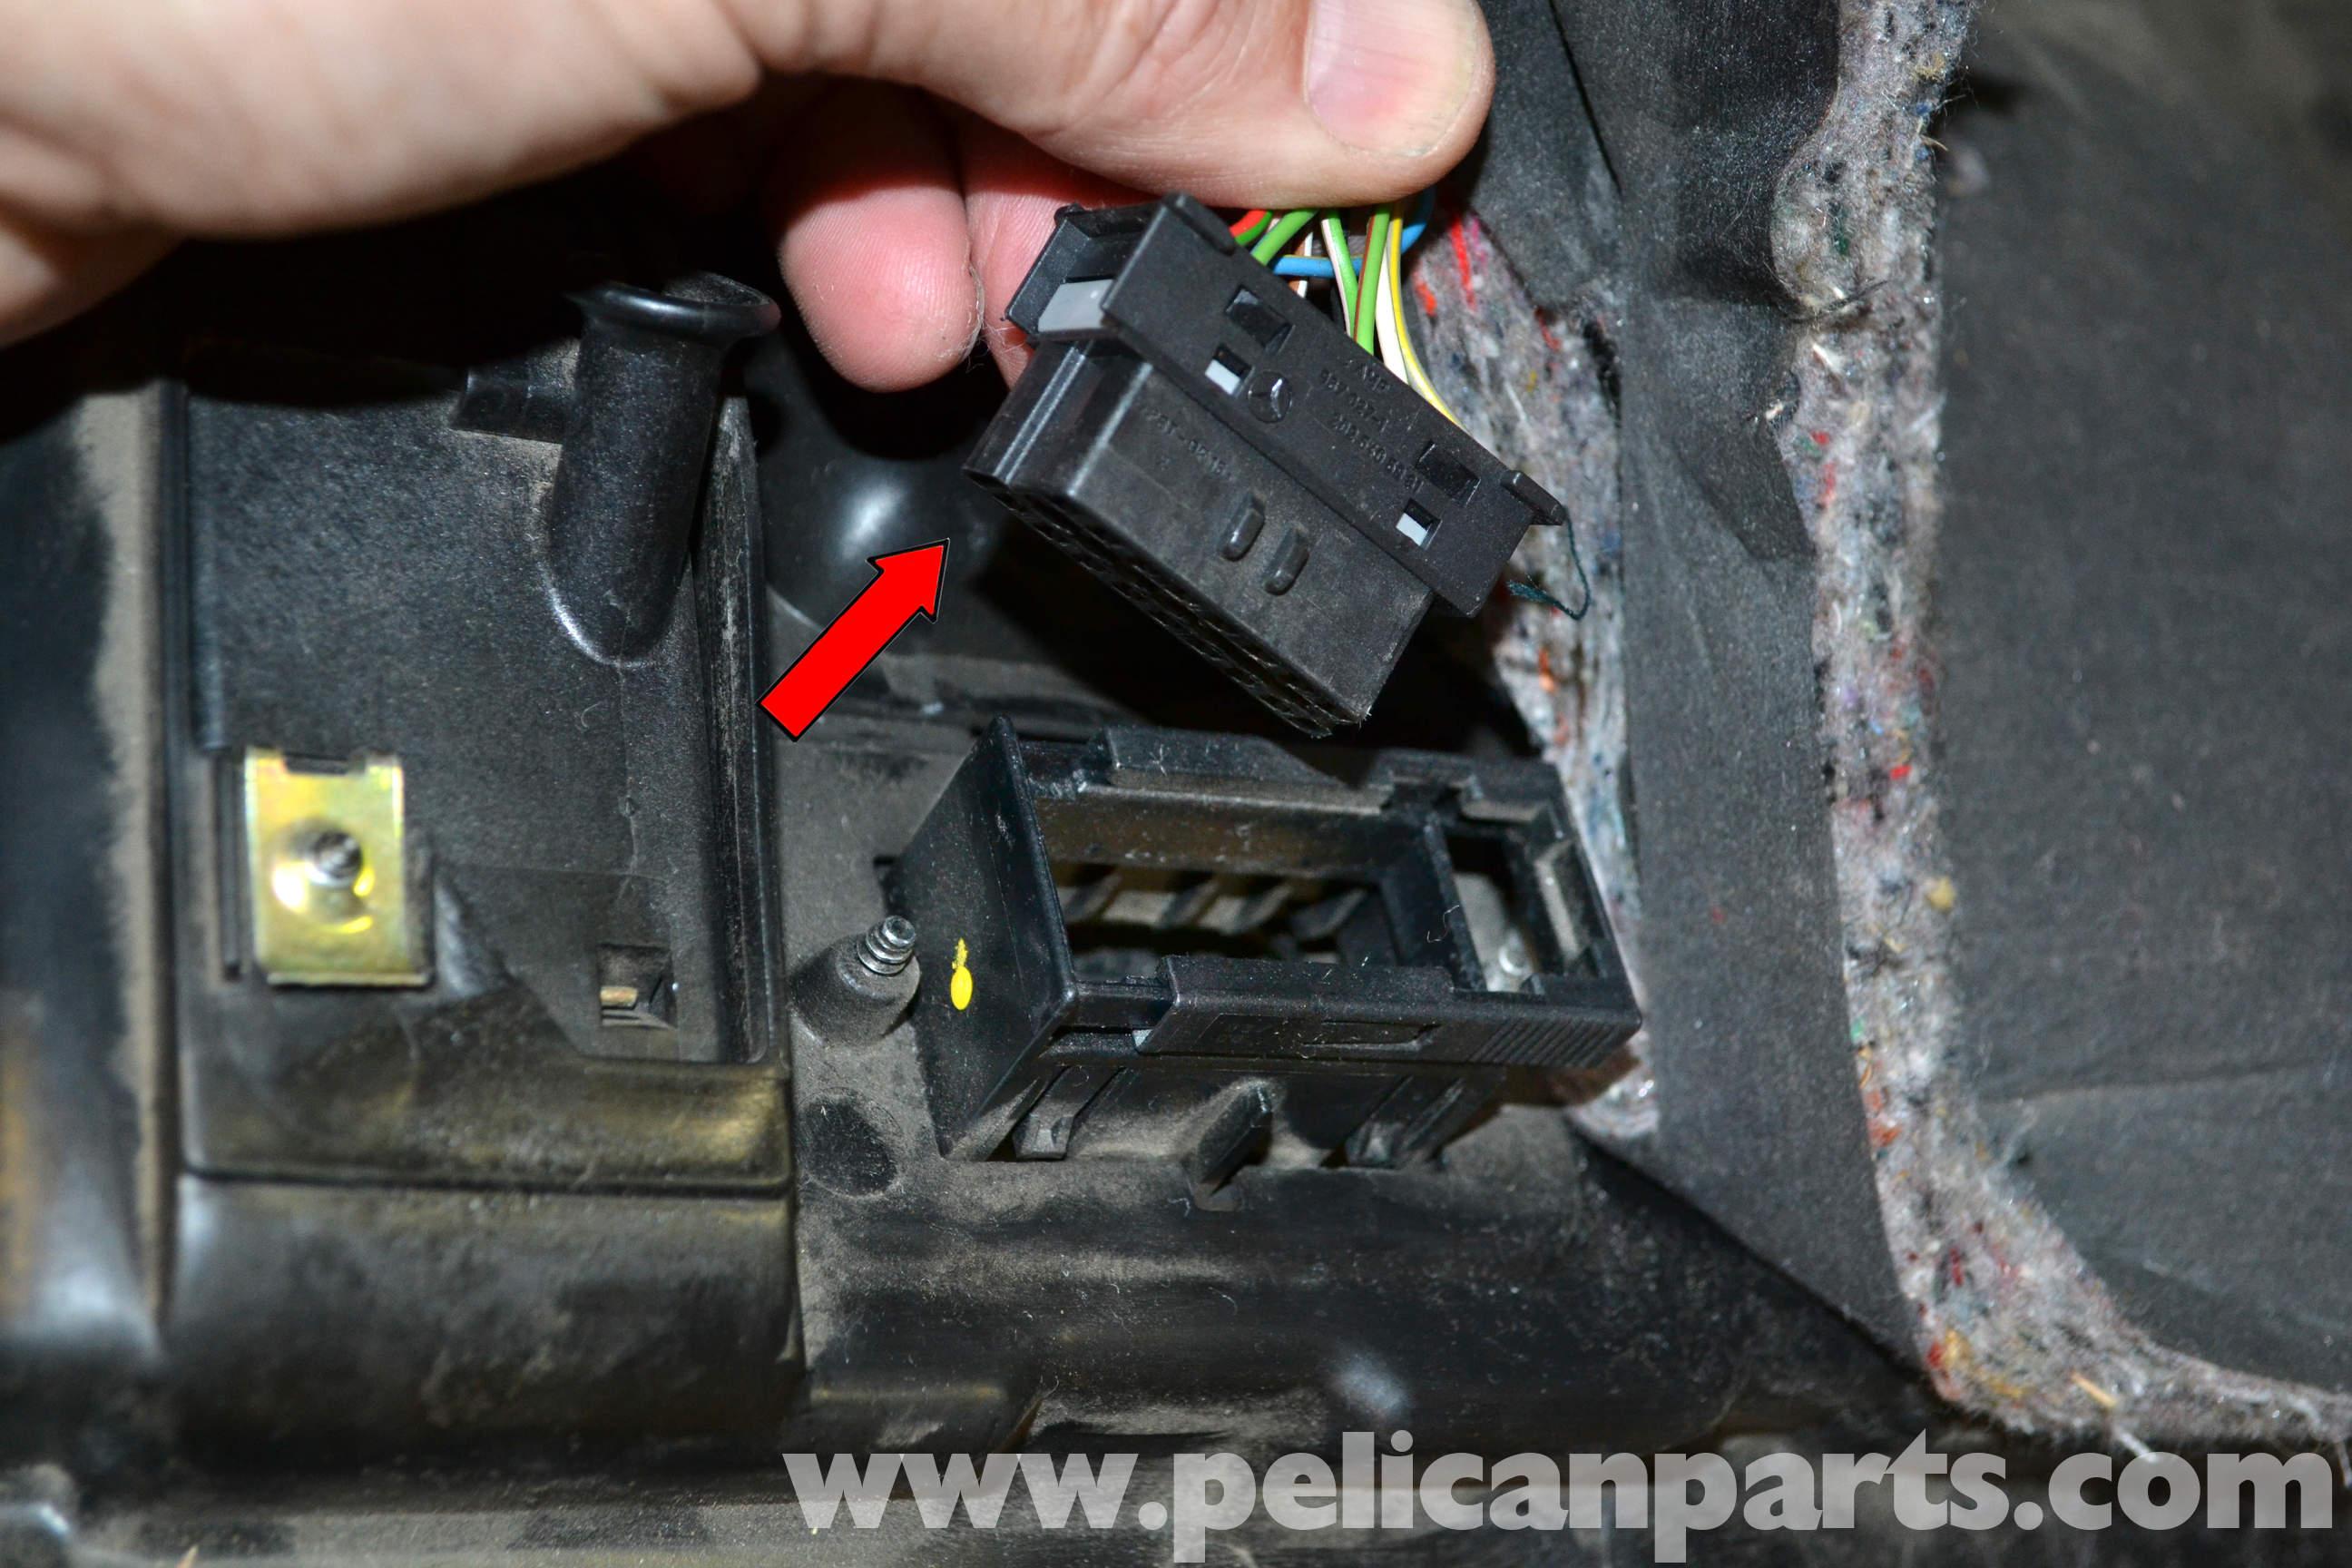 1994 dodge dakota ignition switch wiring diagram hpm intermediate bank 1 sensor 2 fuse location get free image